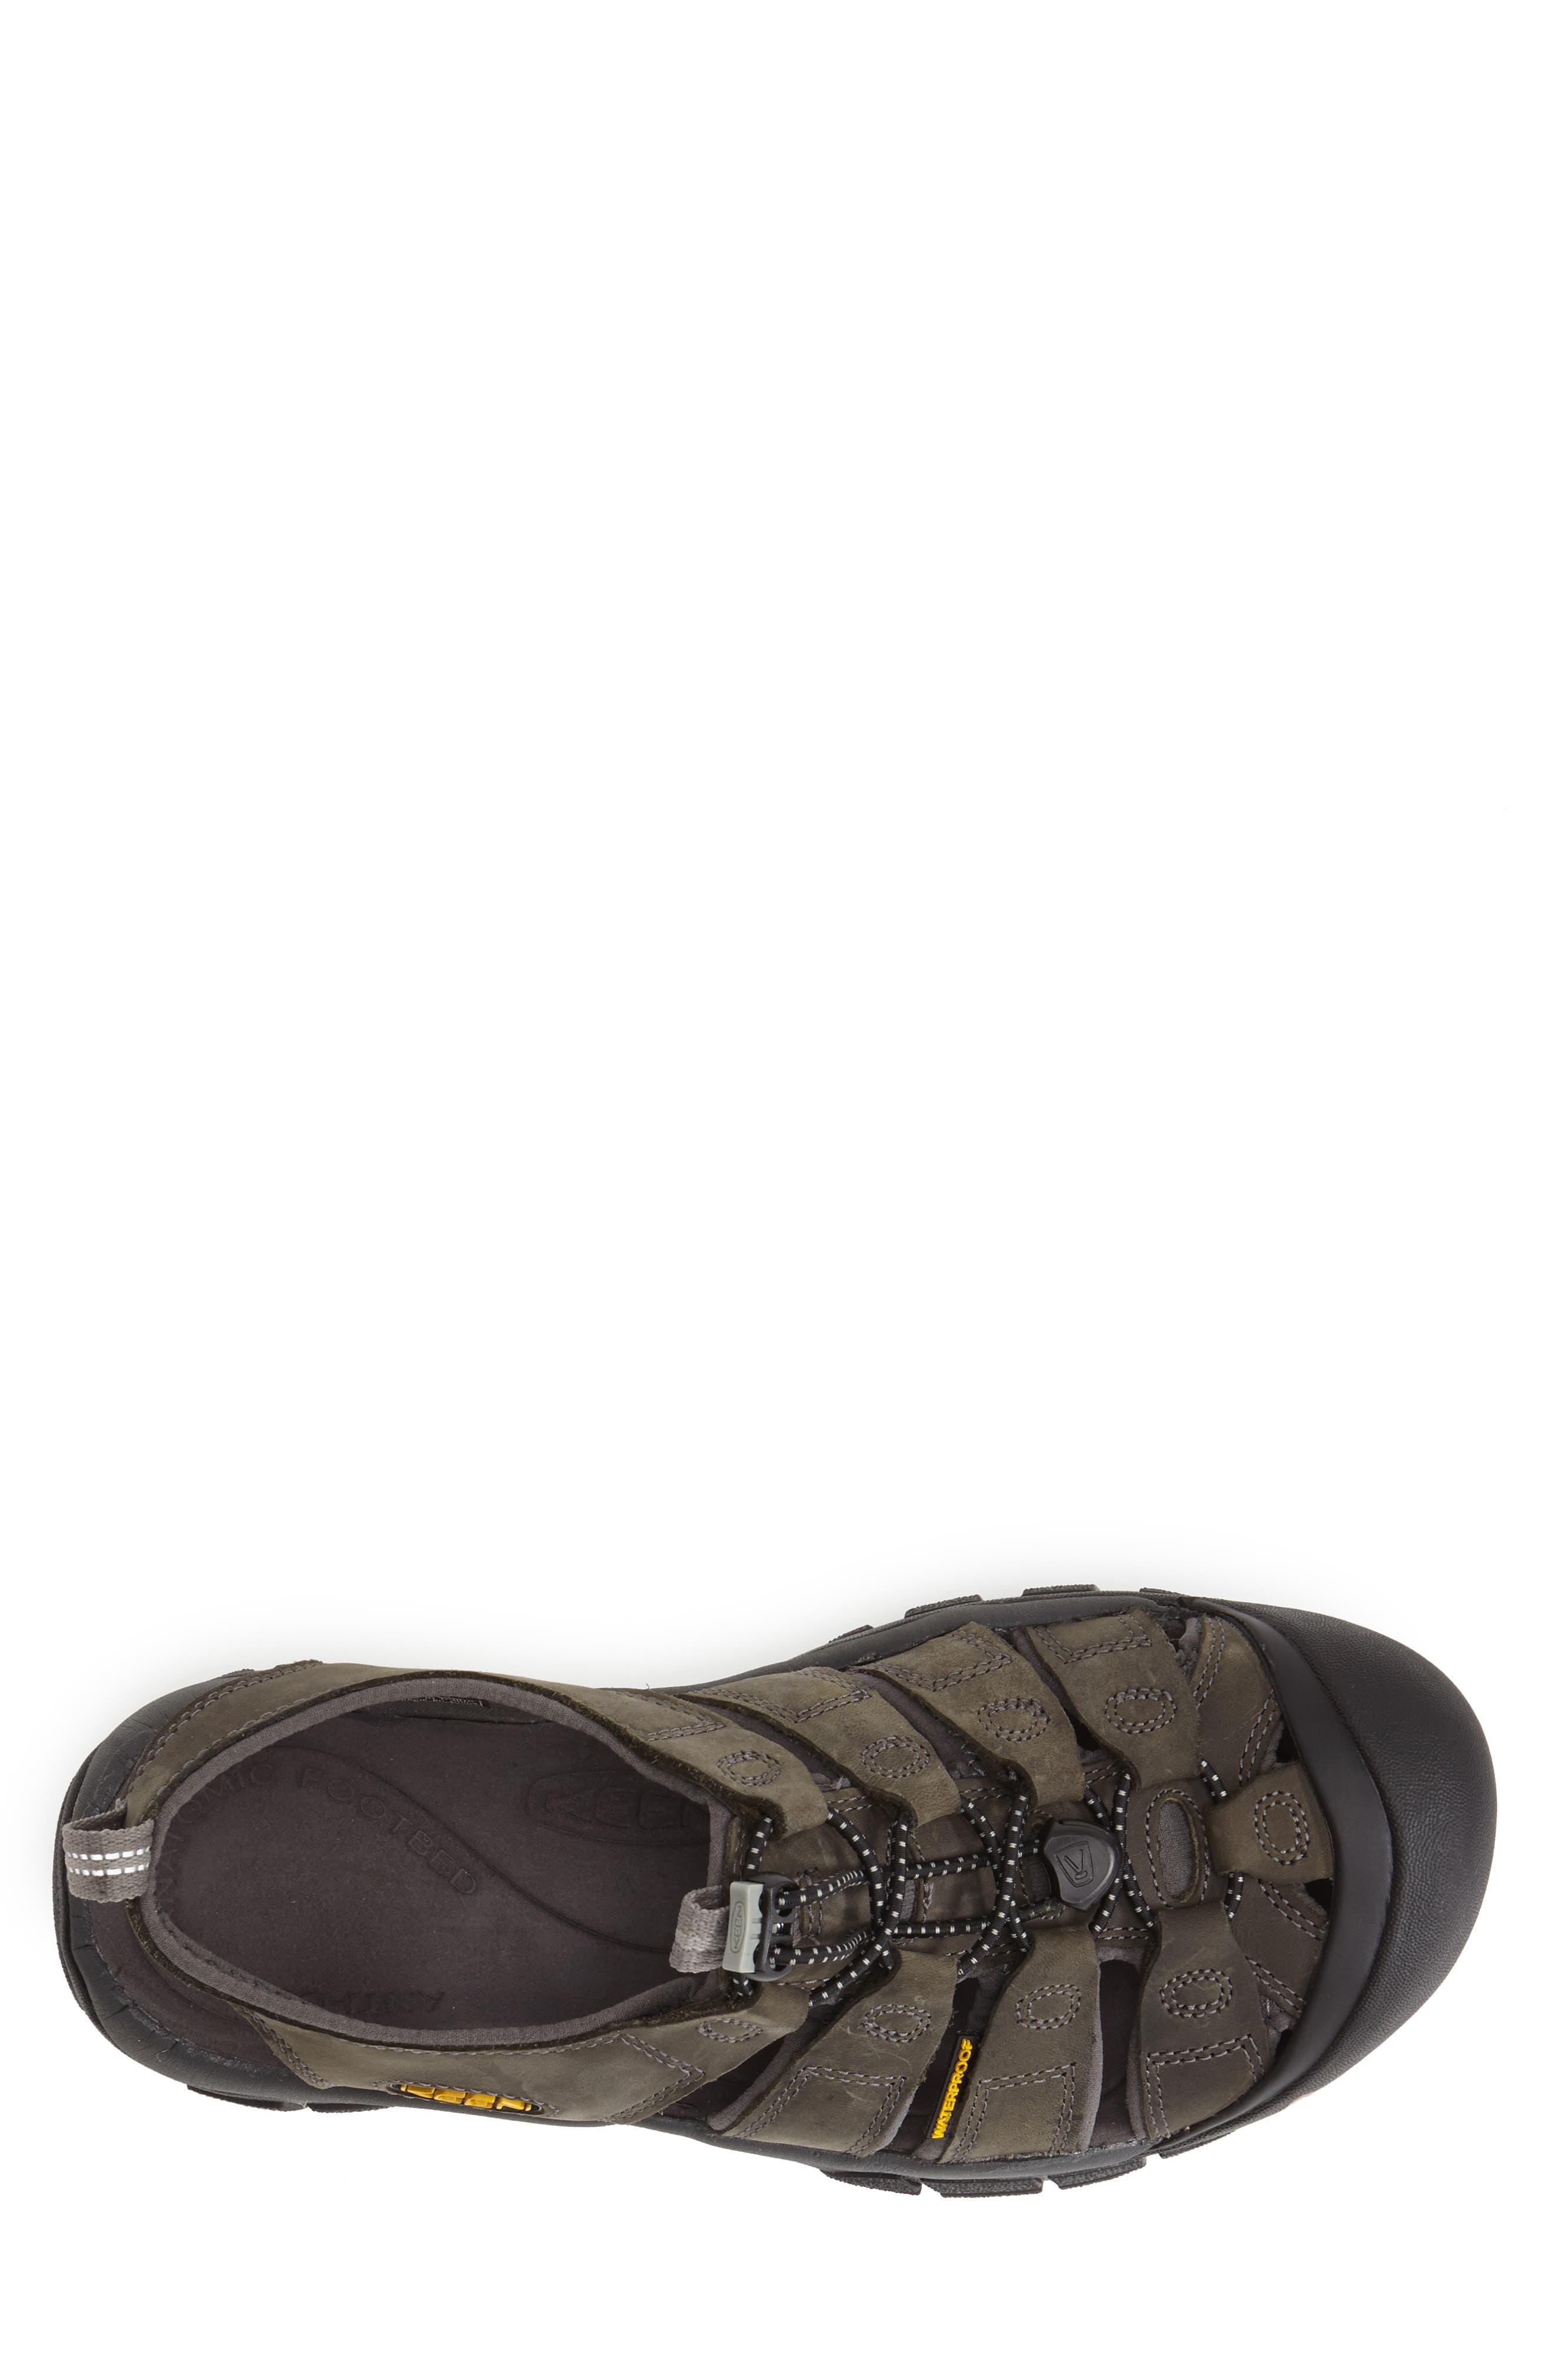 KEEN, 'Newport' Water Sandal, Alternate thumbnail 5, color, NEUTRAL GREY/ GARGOYLE